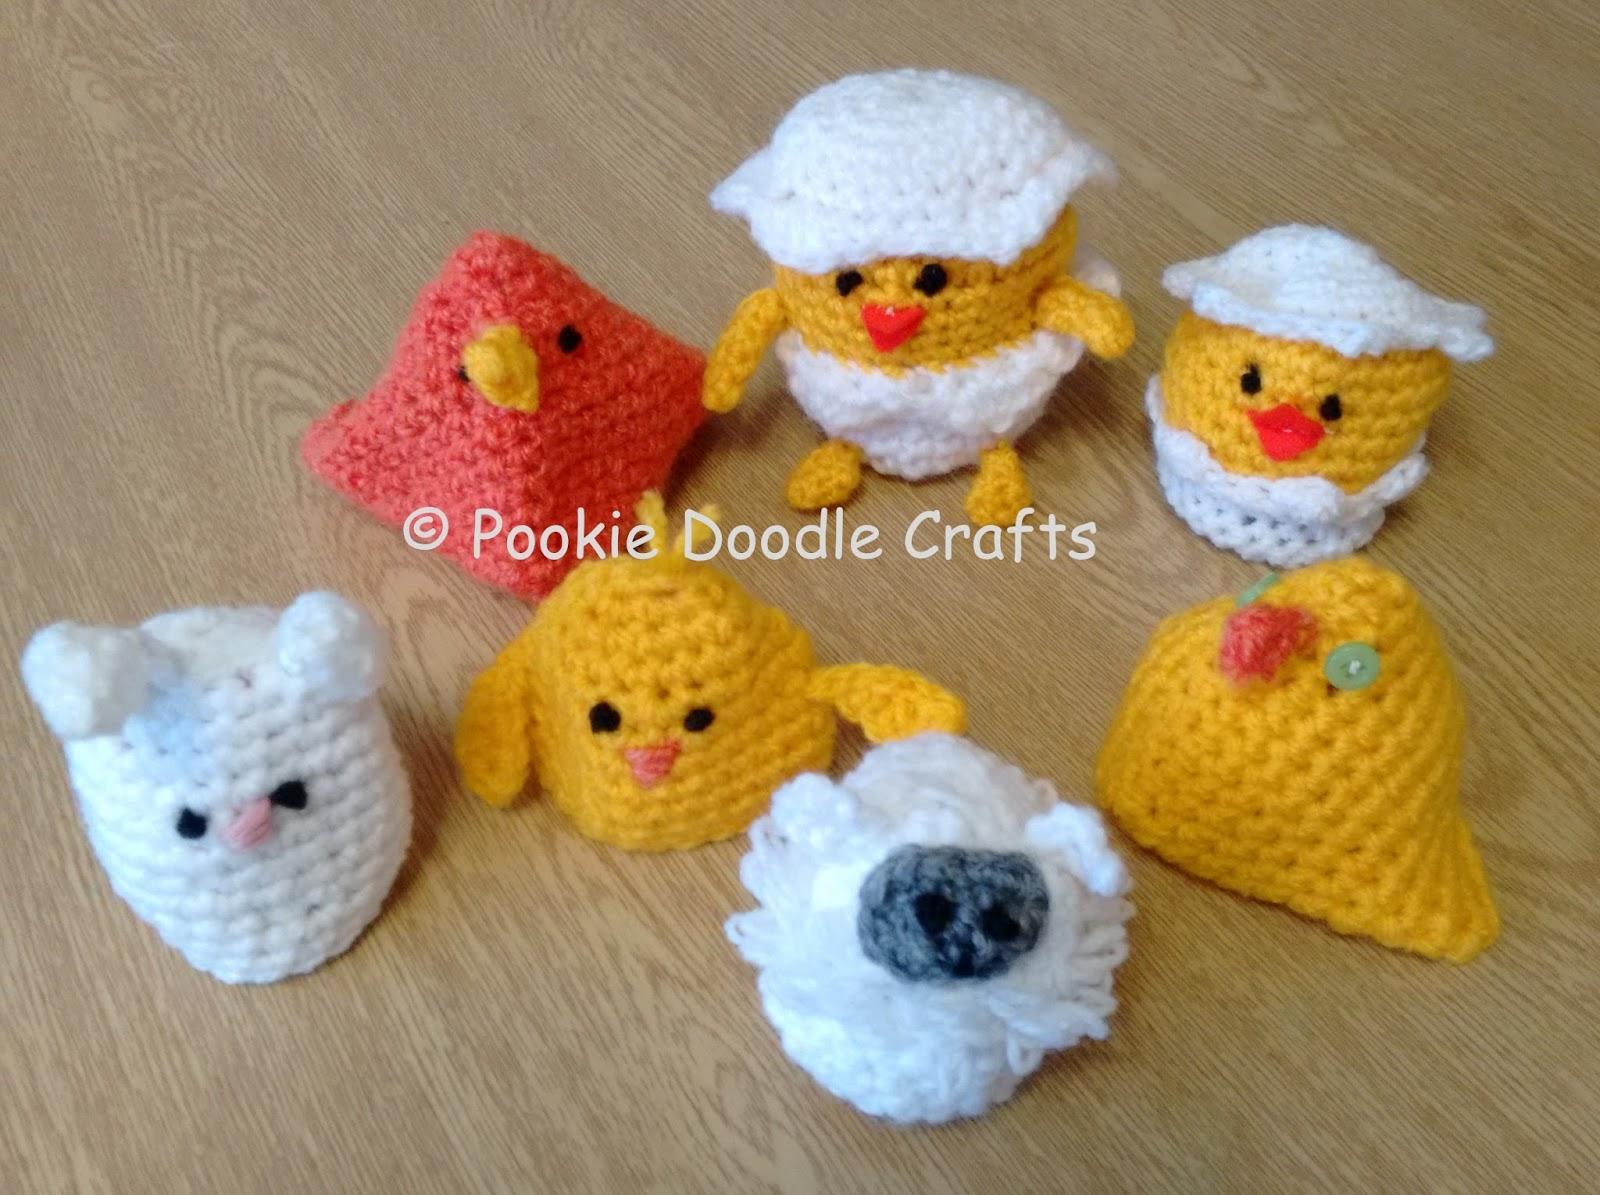 Pookie Doodle Crafts: Crochet Amigurumi Chocolate Easter Egg Holders ...